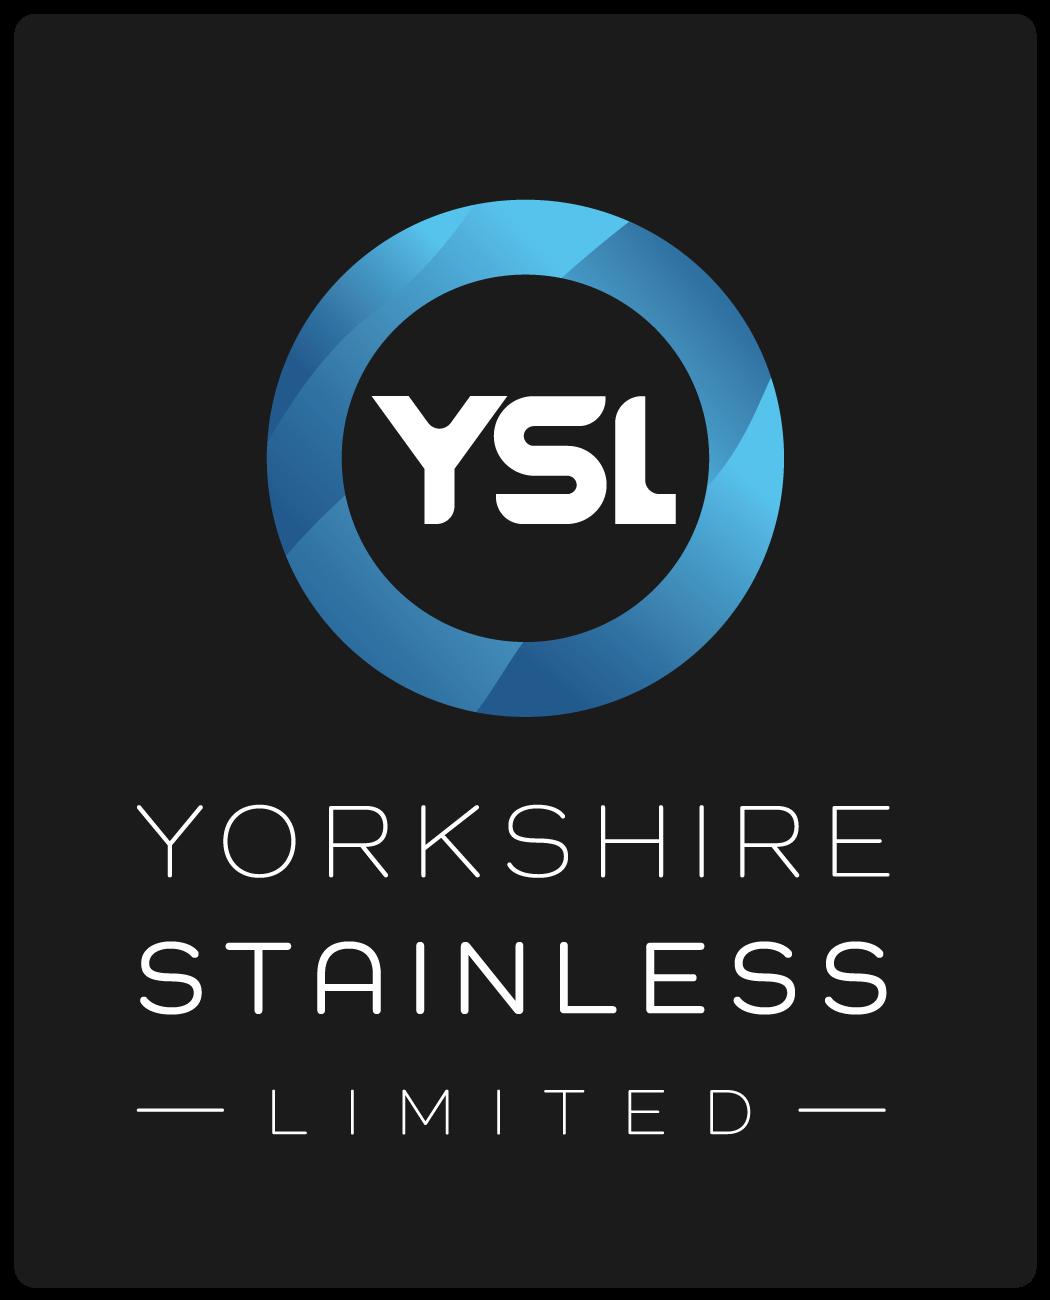 Yorkshire Stainless Ltd